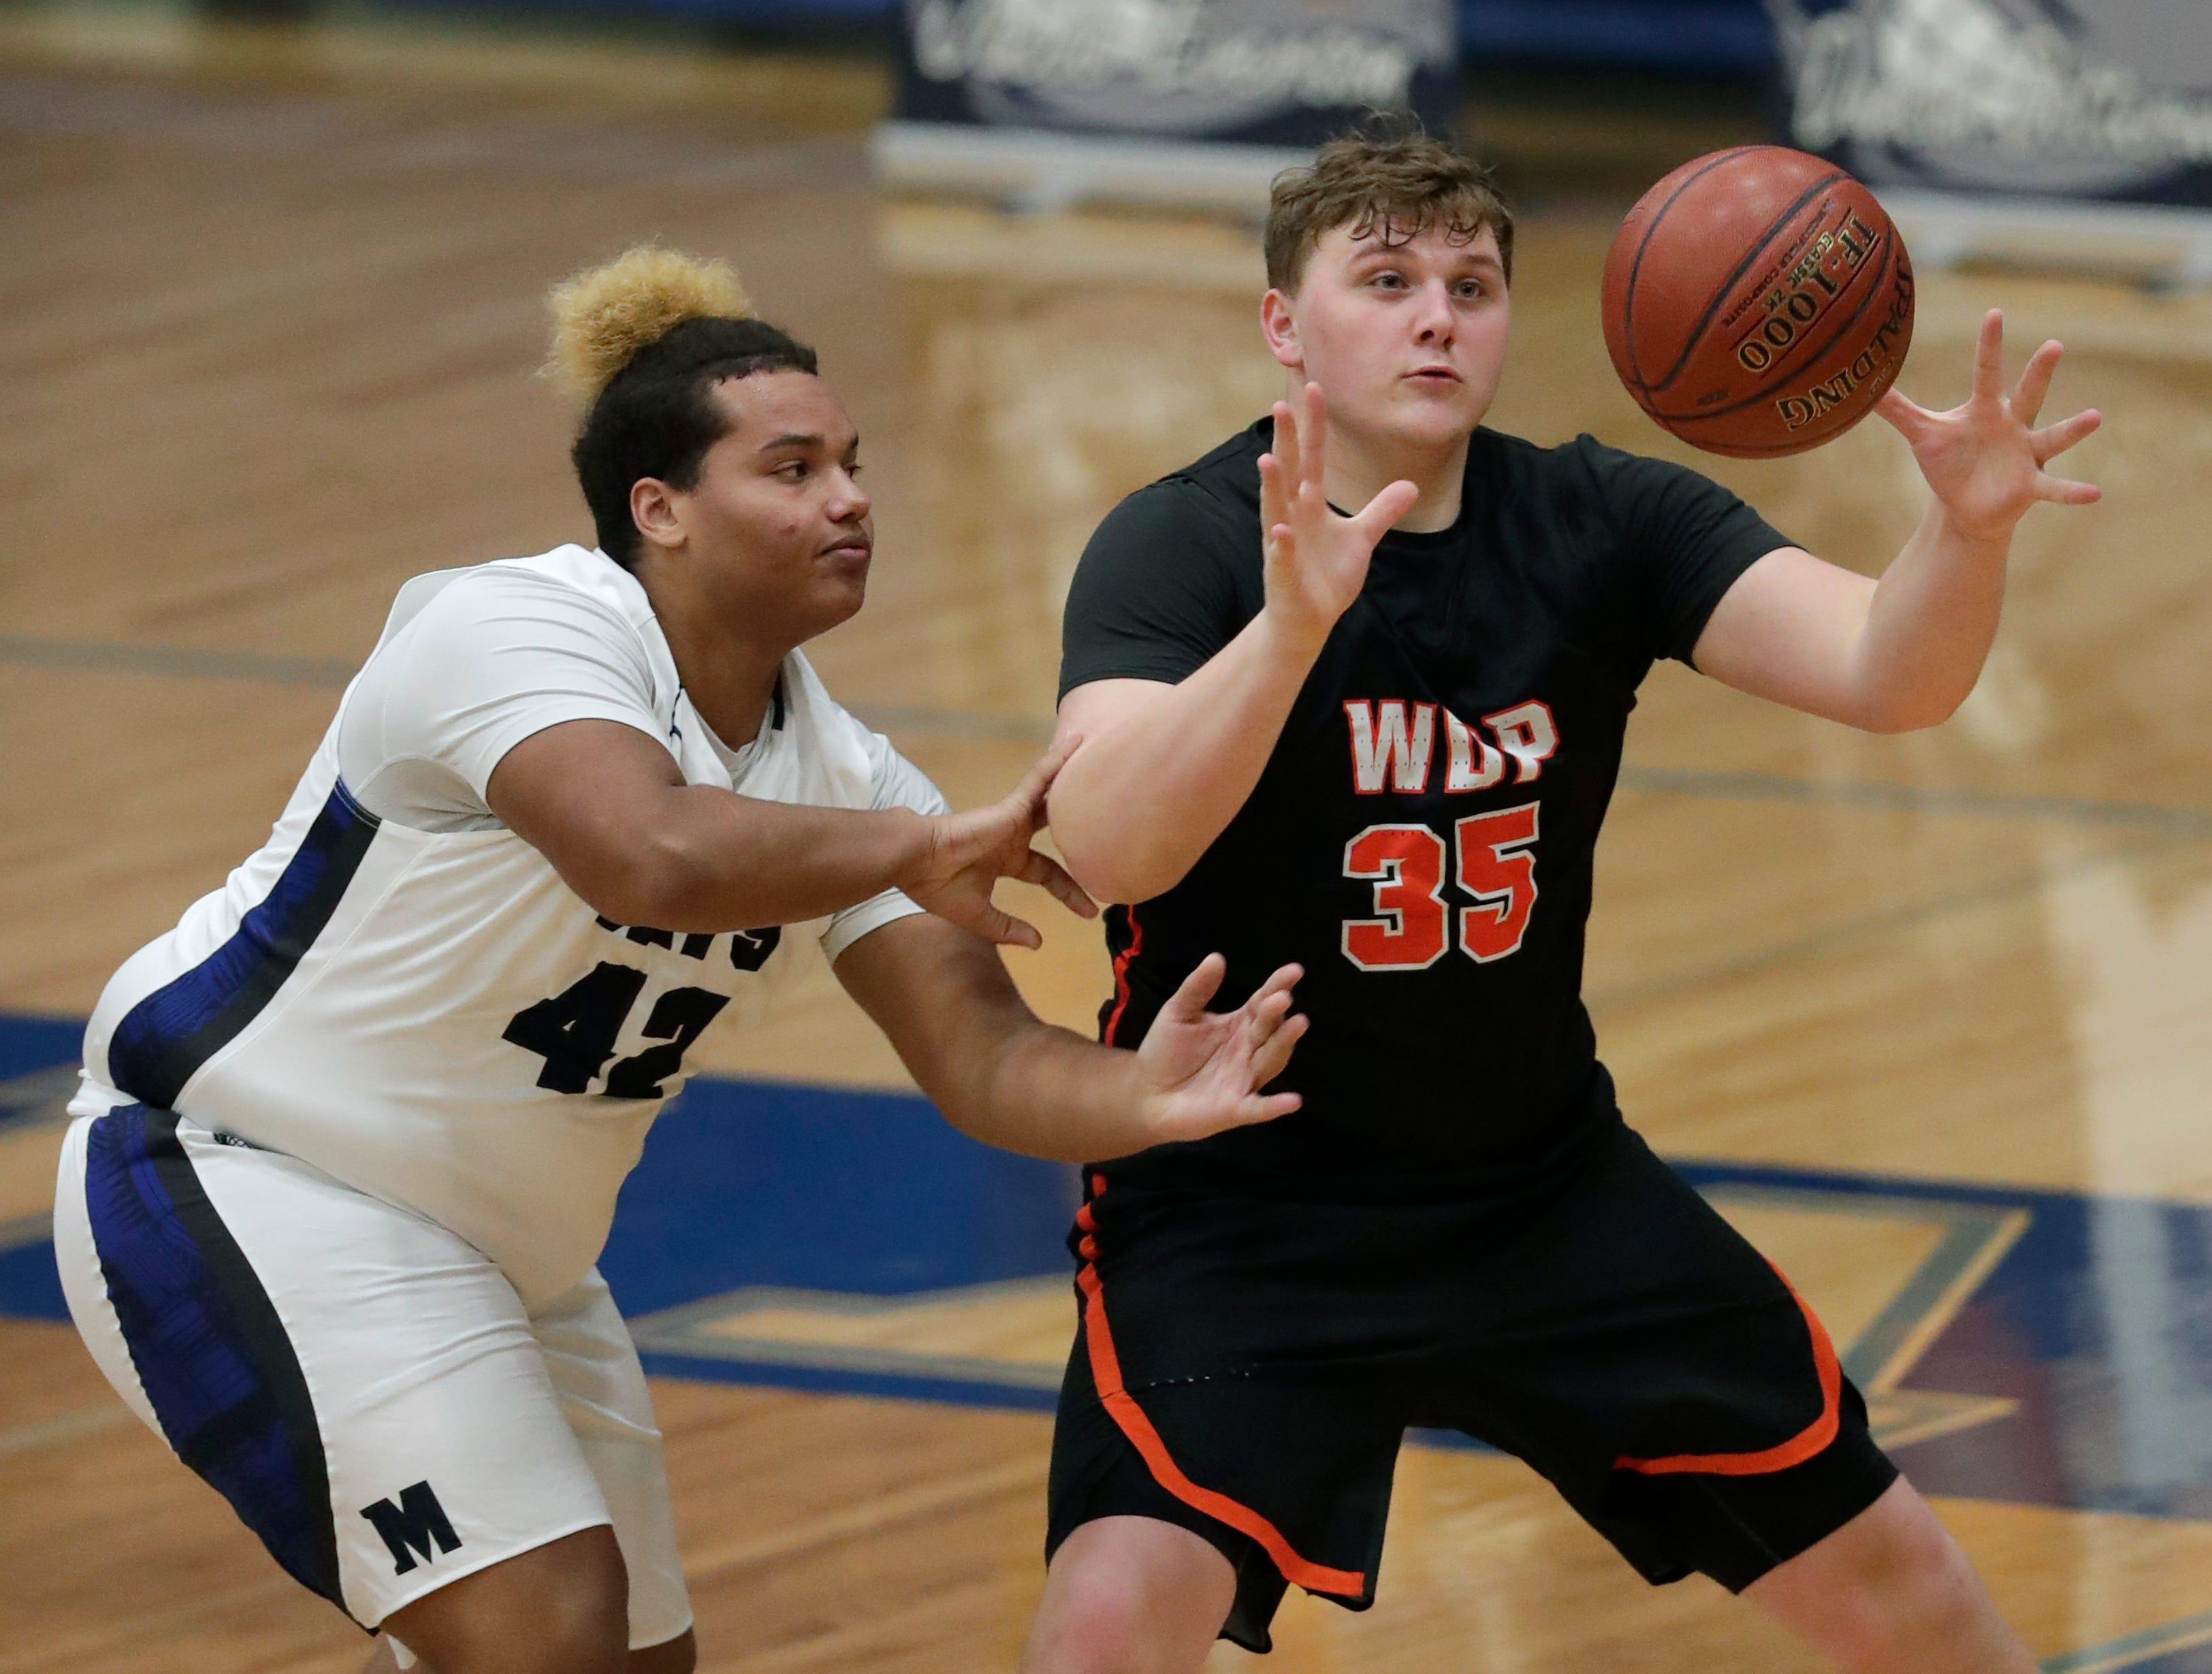 Menasha High School's Eli Williams (42) defends against West De Pere High School's Kerry Kodanko (35) during their boys basketball game Tuesday, December 11, 2018, in Menasha, Wis. Dan Powers/USA TODAY NETWORK-Wisconsin